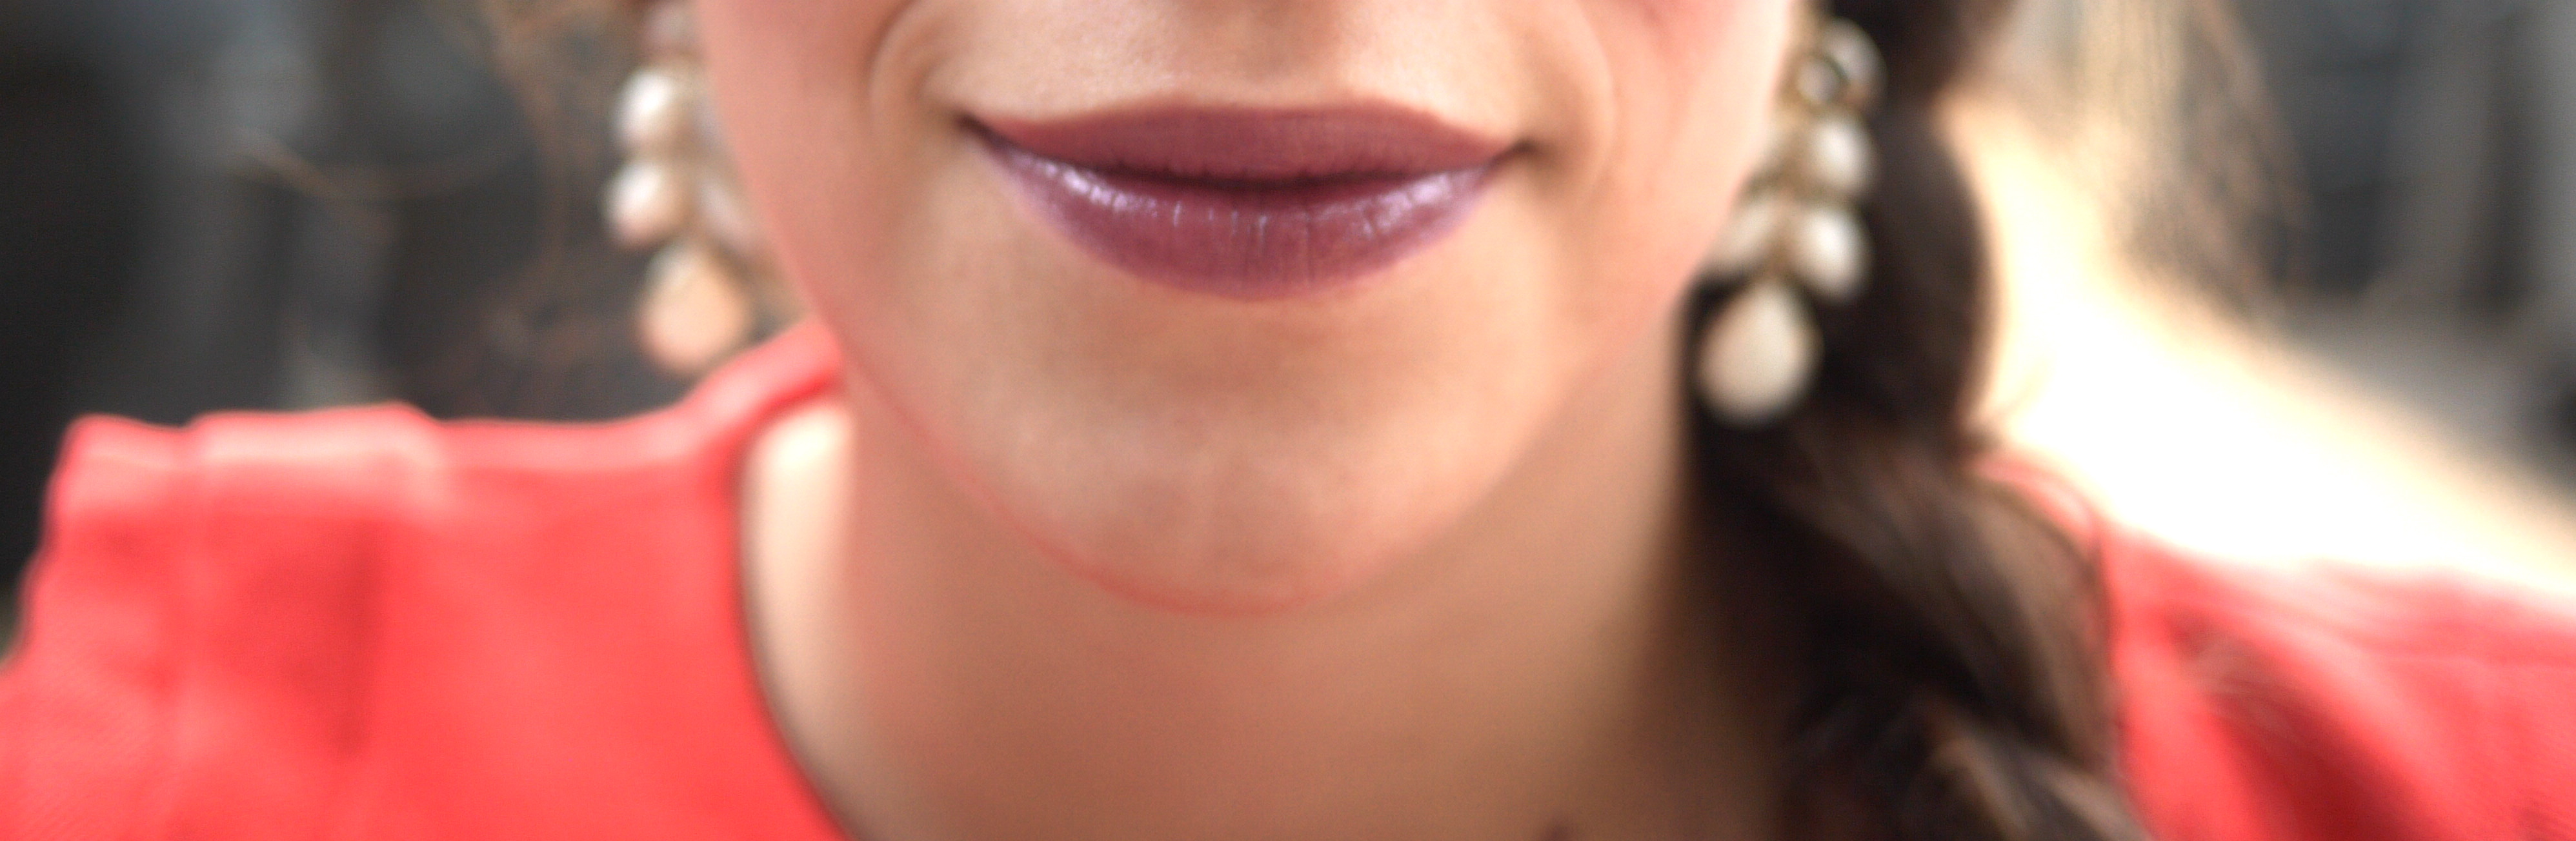 Nars Lipstick: Fast Ride + Belle du Jour | Style Anthology